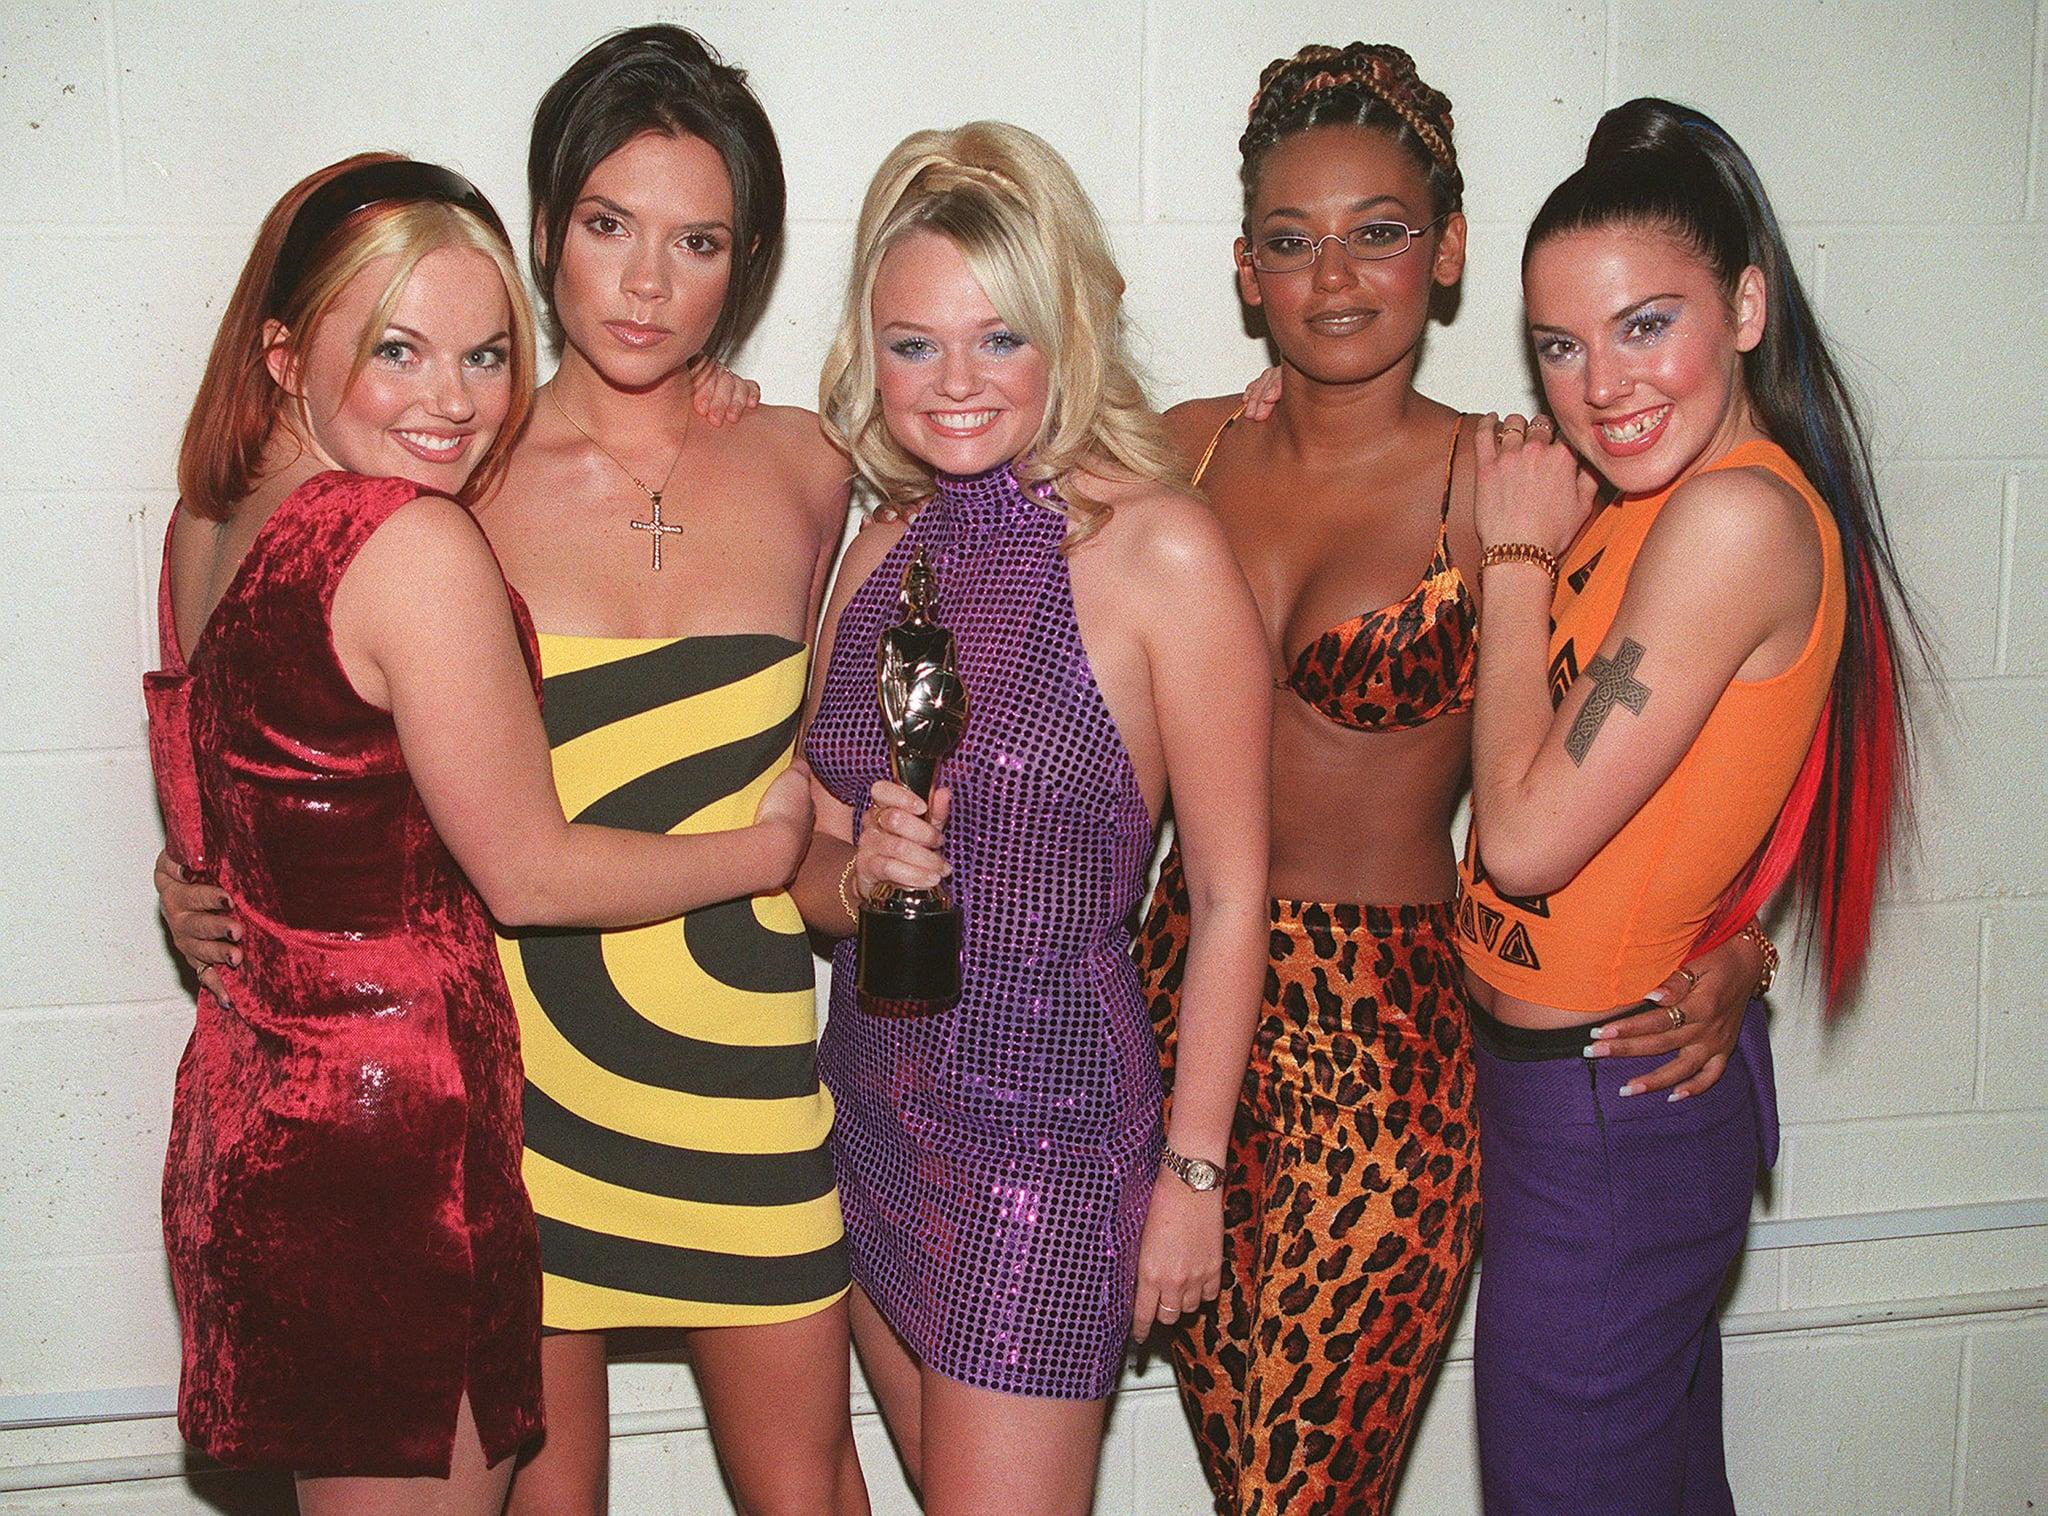 LONDON - 1995: The Spice Girls L to R Geri Halliwell, Victoria Adams, Emma Bunton, Melanie Brown and Melanie Chisholm at the Brit Awards. (Photo by Dave Hogan/Getty Images)